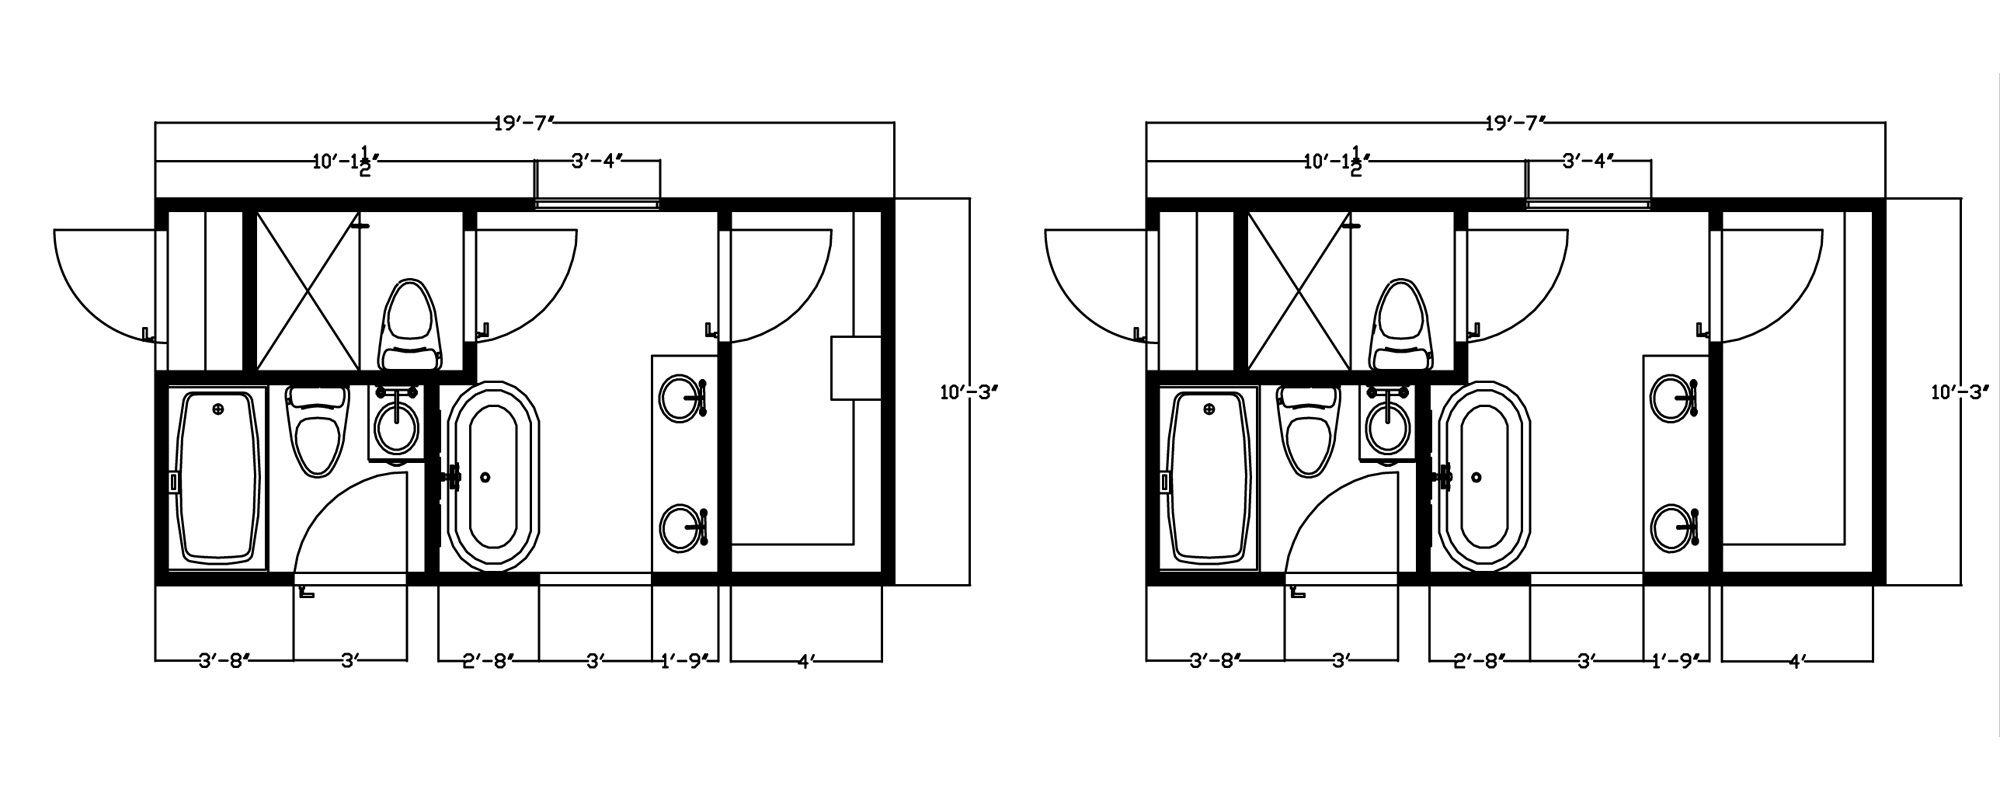 10x12 Master Bath Floor Plans 10x12 Master Bath Floor Plans